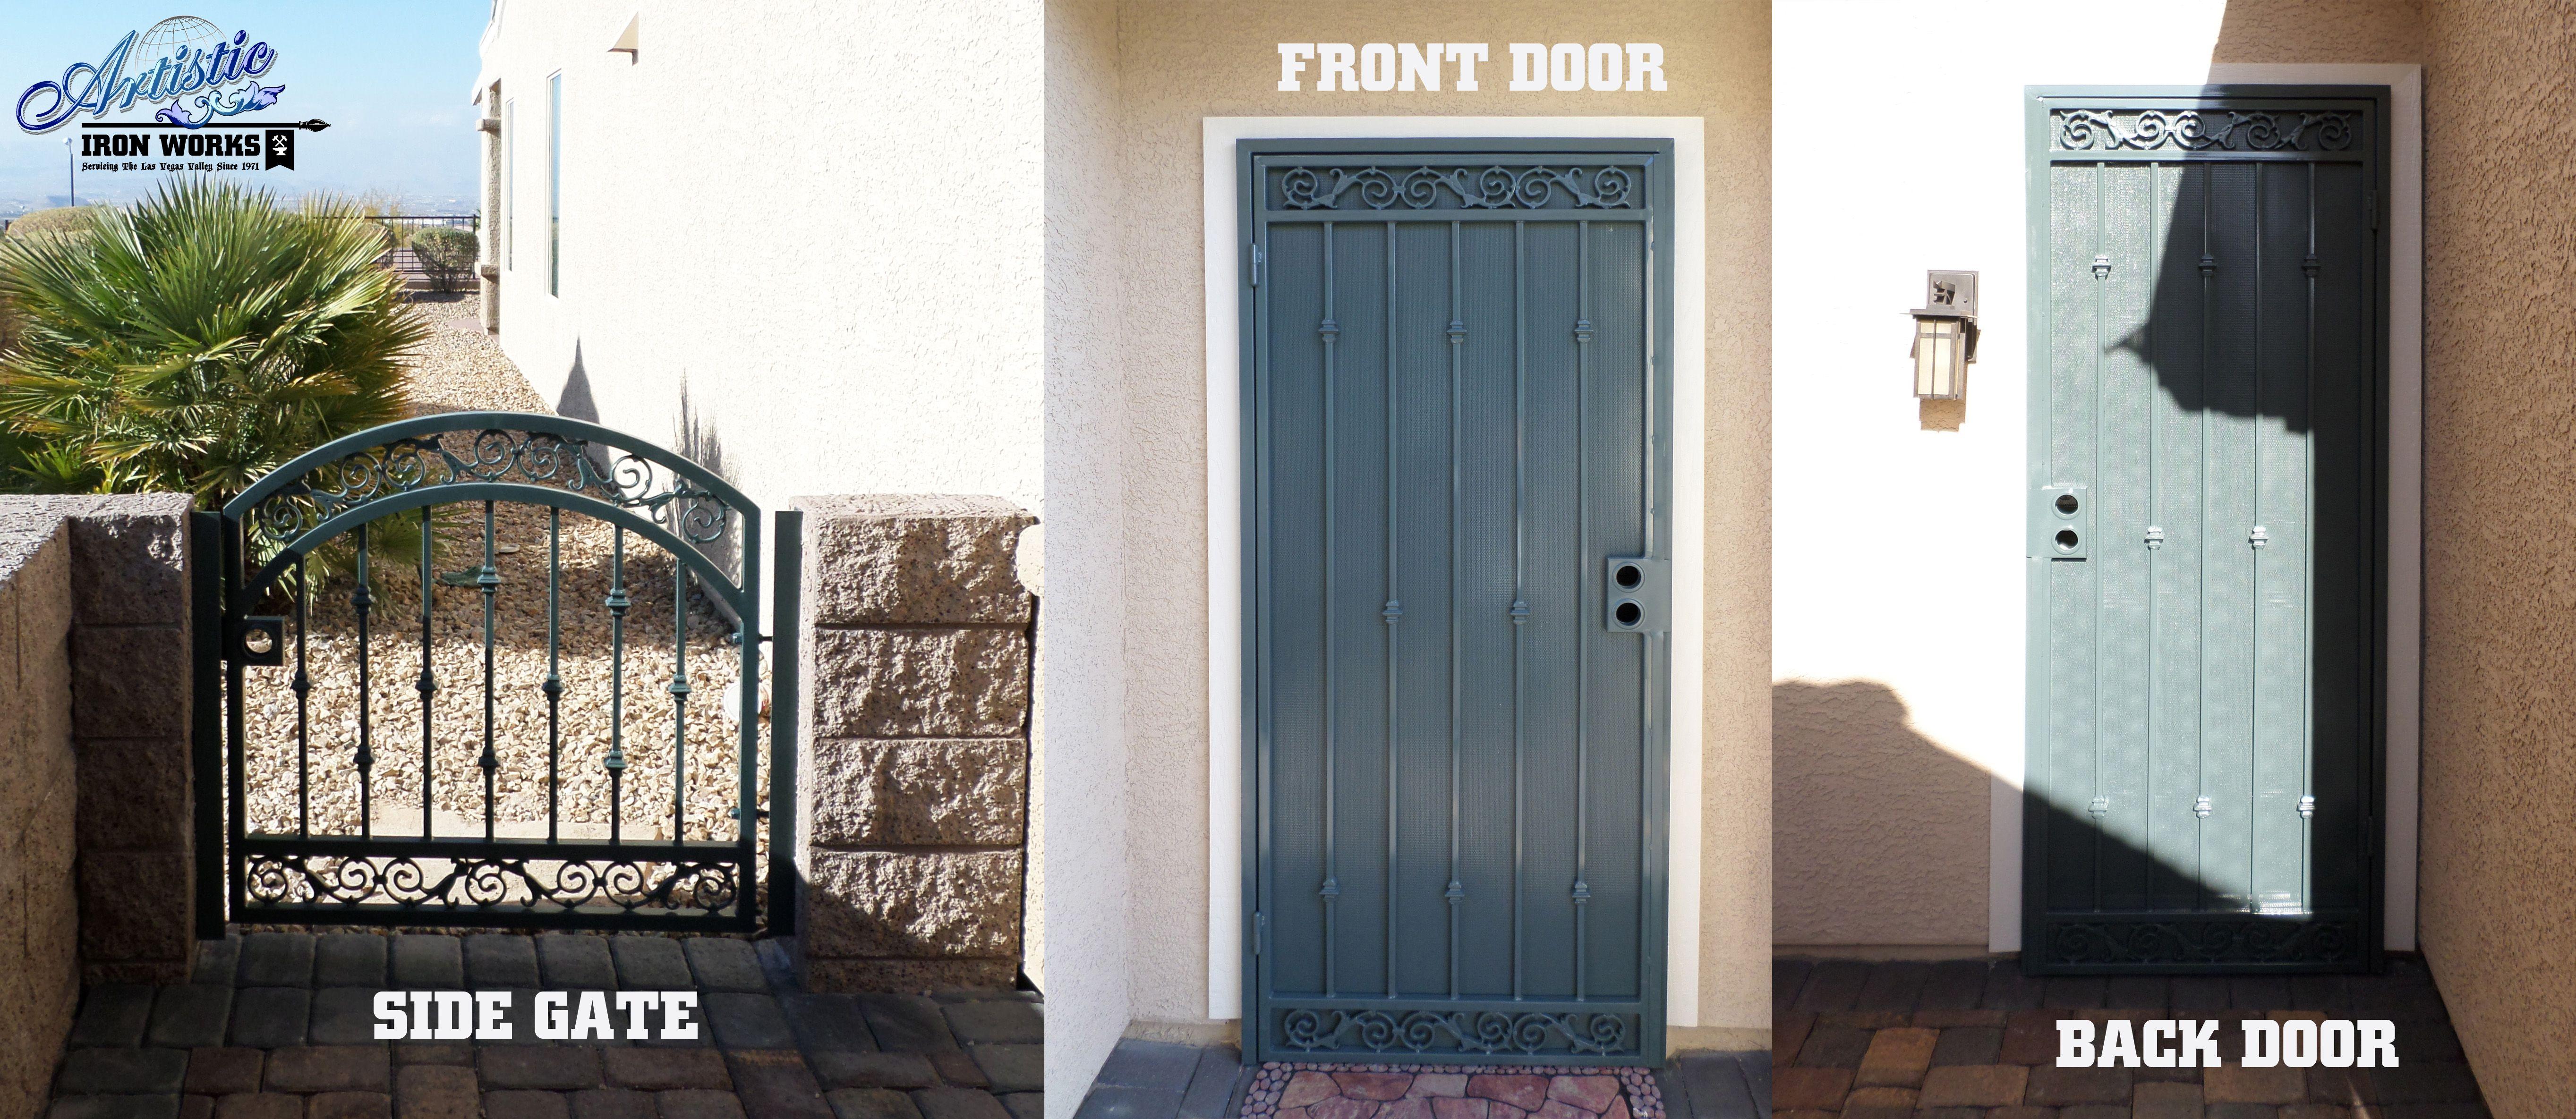 Santiago Matching Wrought Iron Security Doors And Gate Sd0159 Wrought Iron Security Doors Iron Security Doors Doors